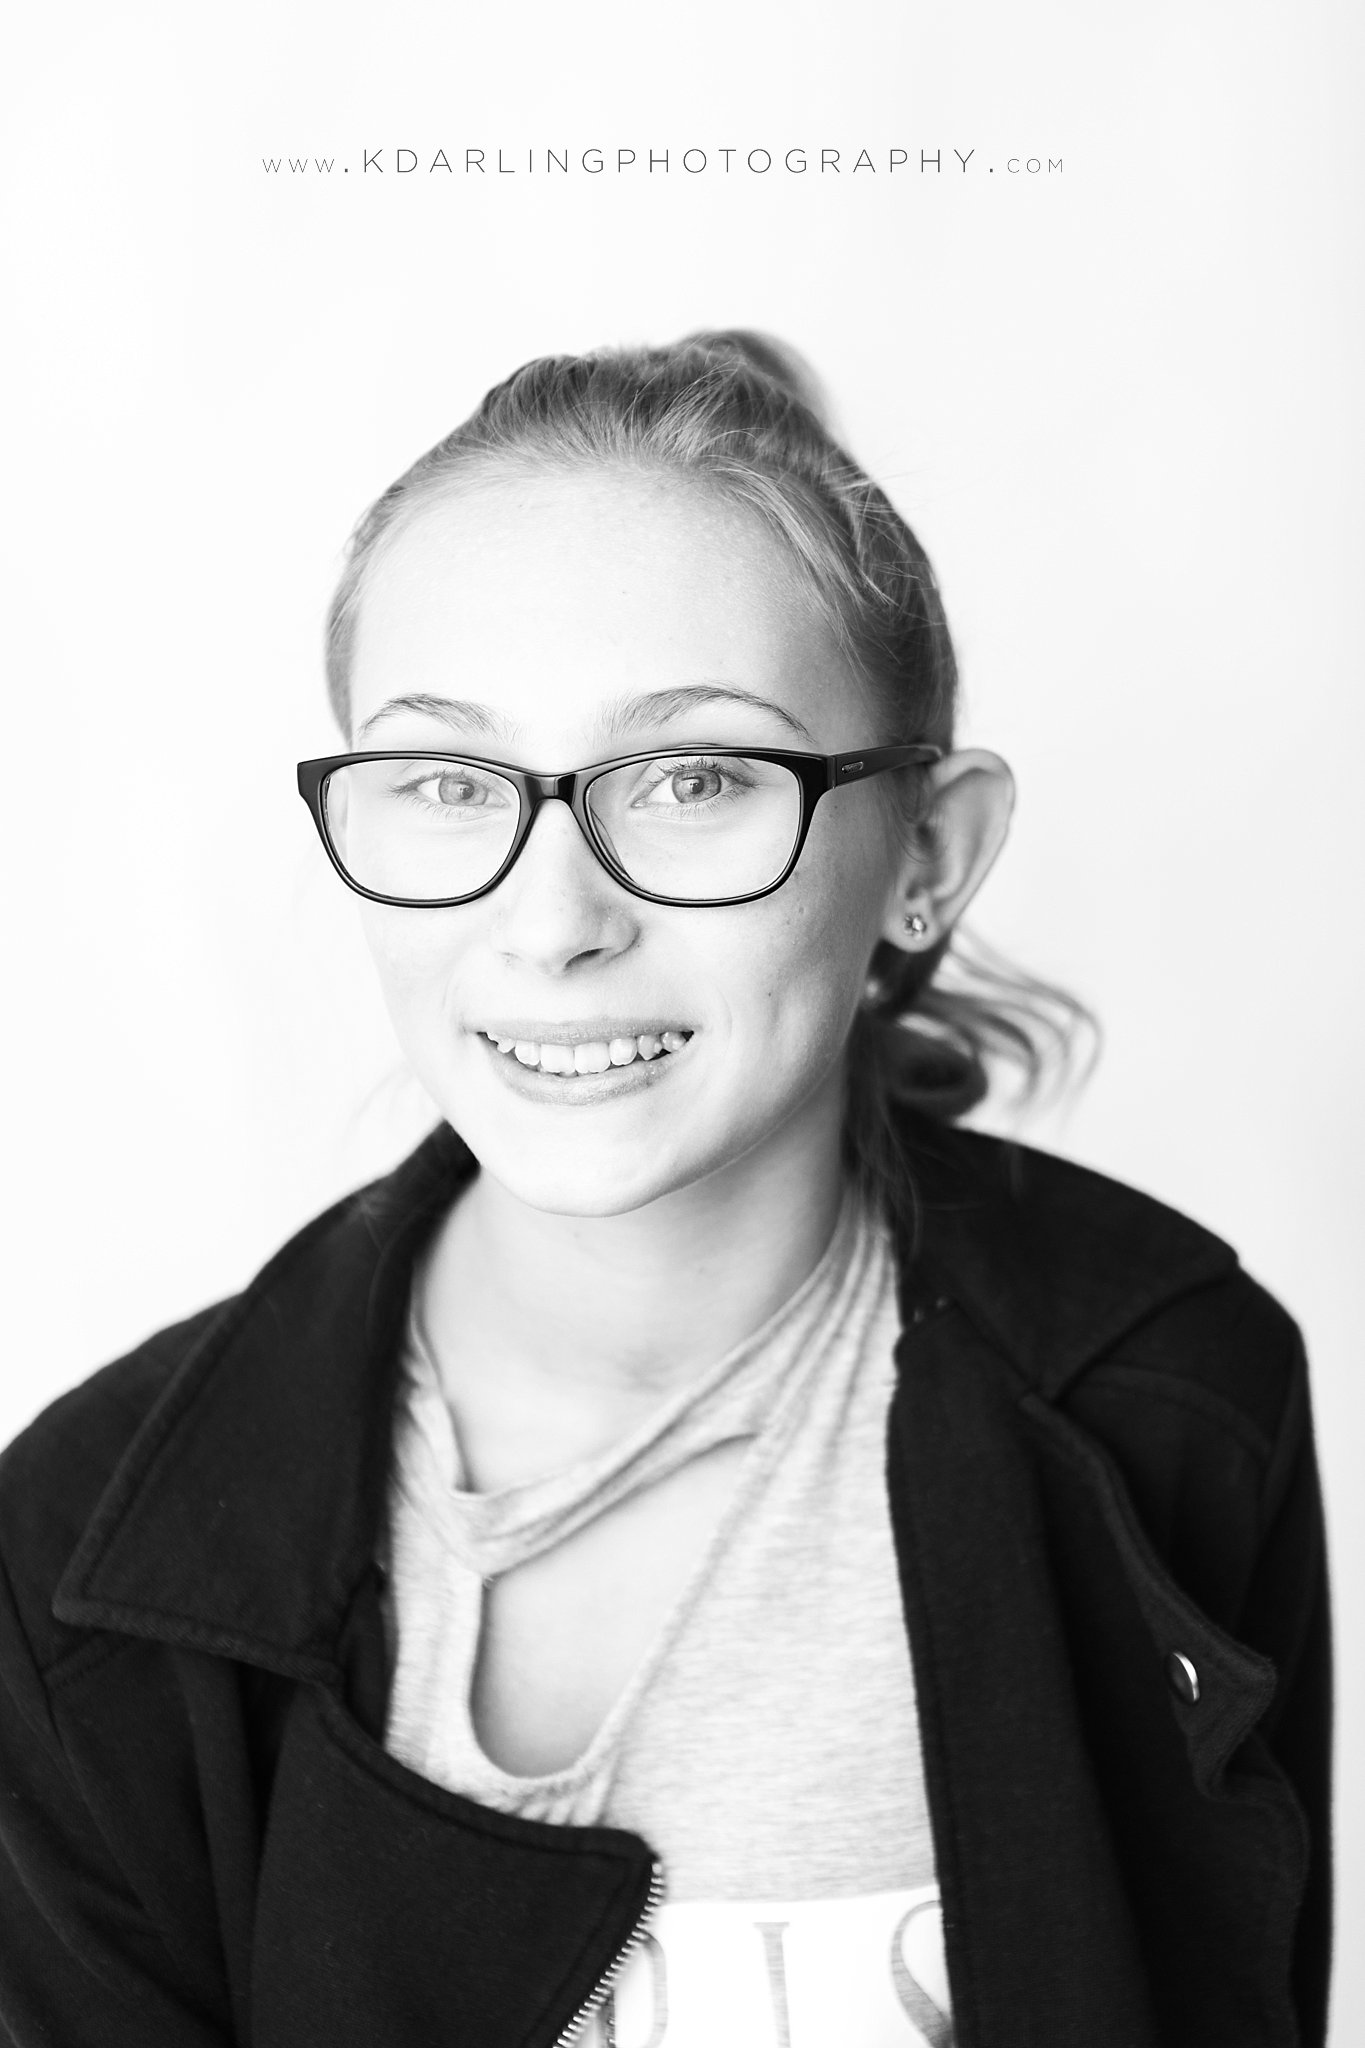 Child-Photographer-portraits-Champaign-County-IL-Fisher-Studio-Darling_0175.jpg